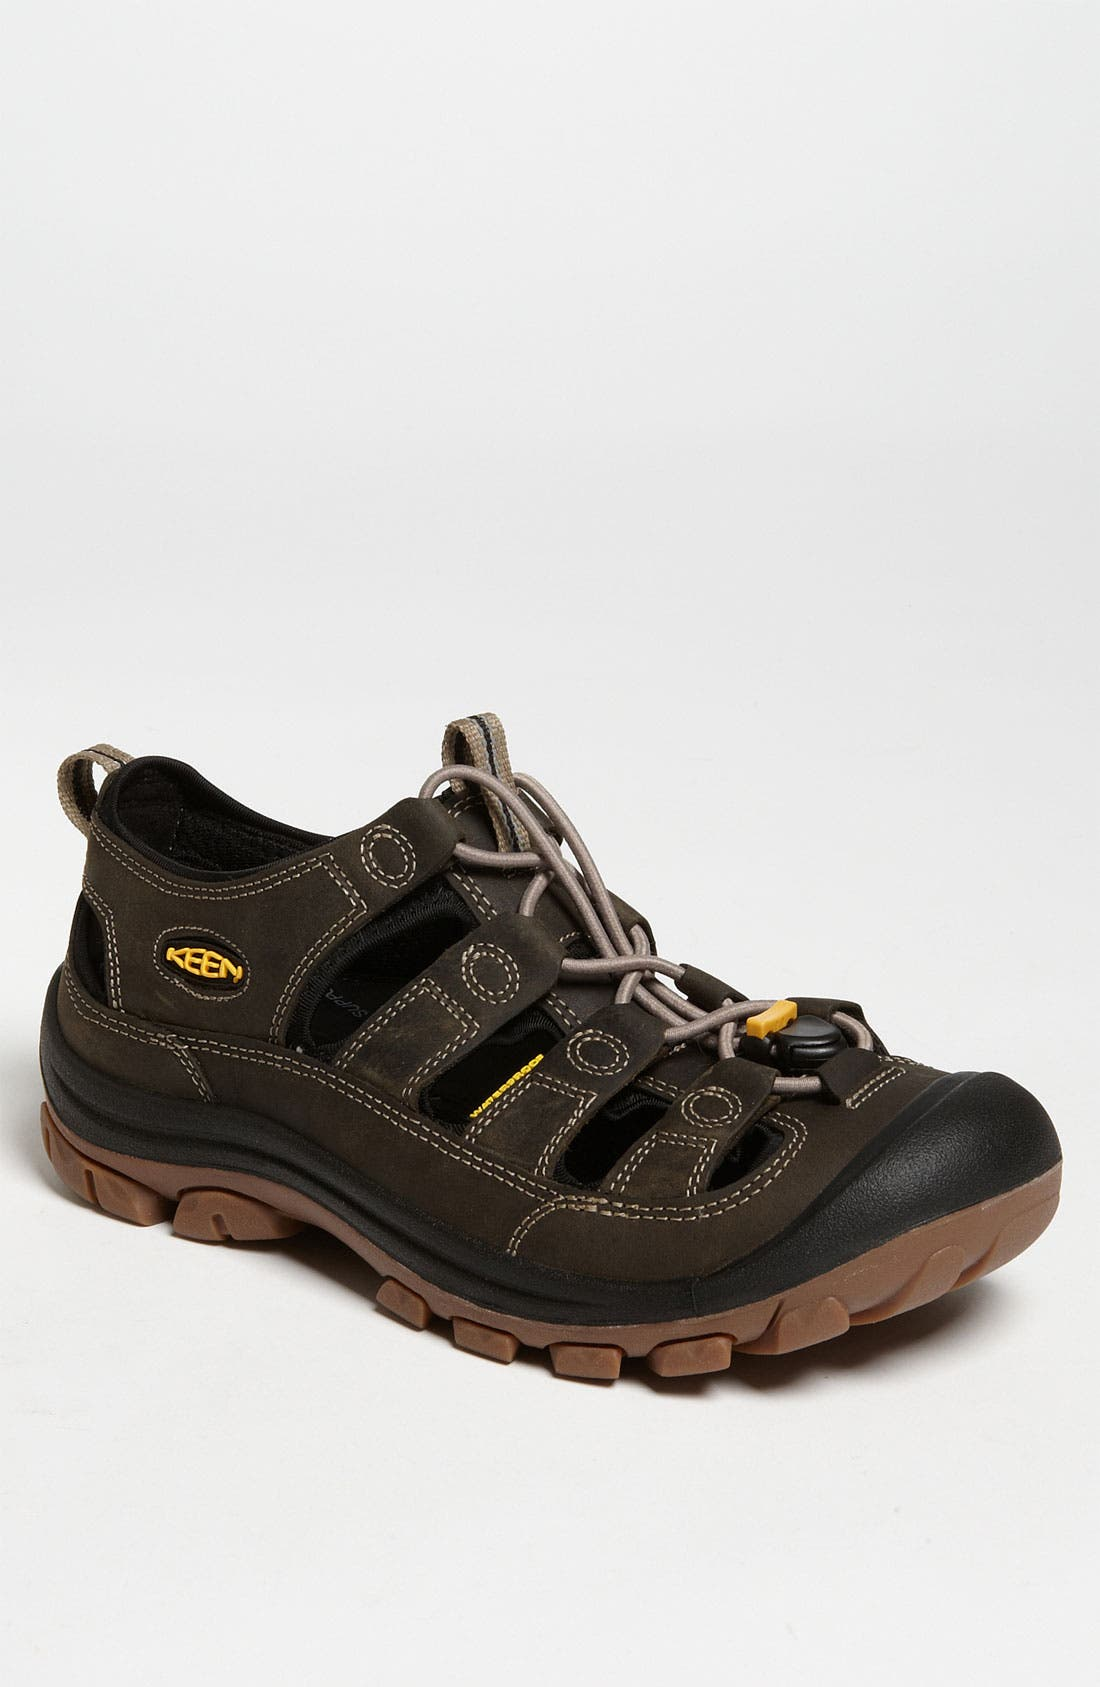 Main Image - Keen 'Glisan' Sandal